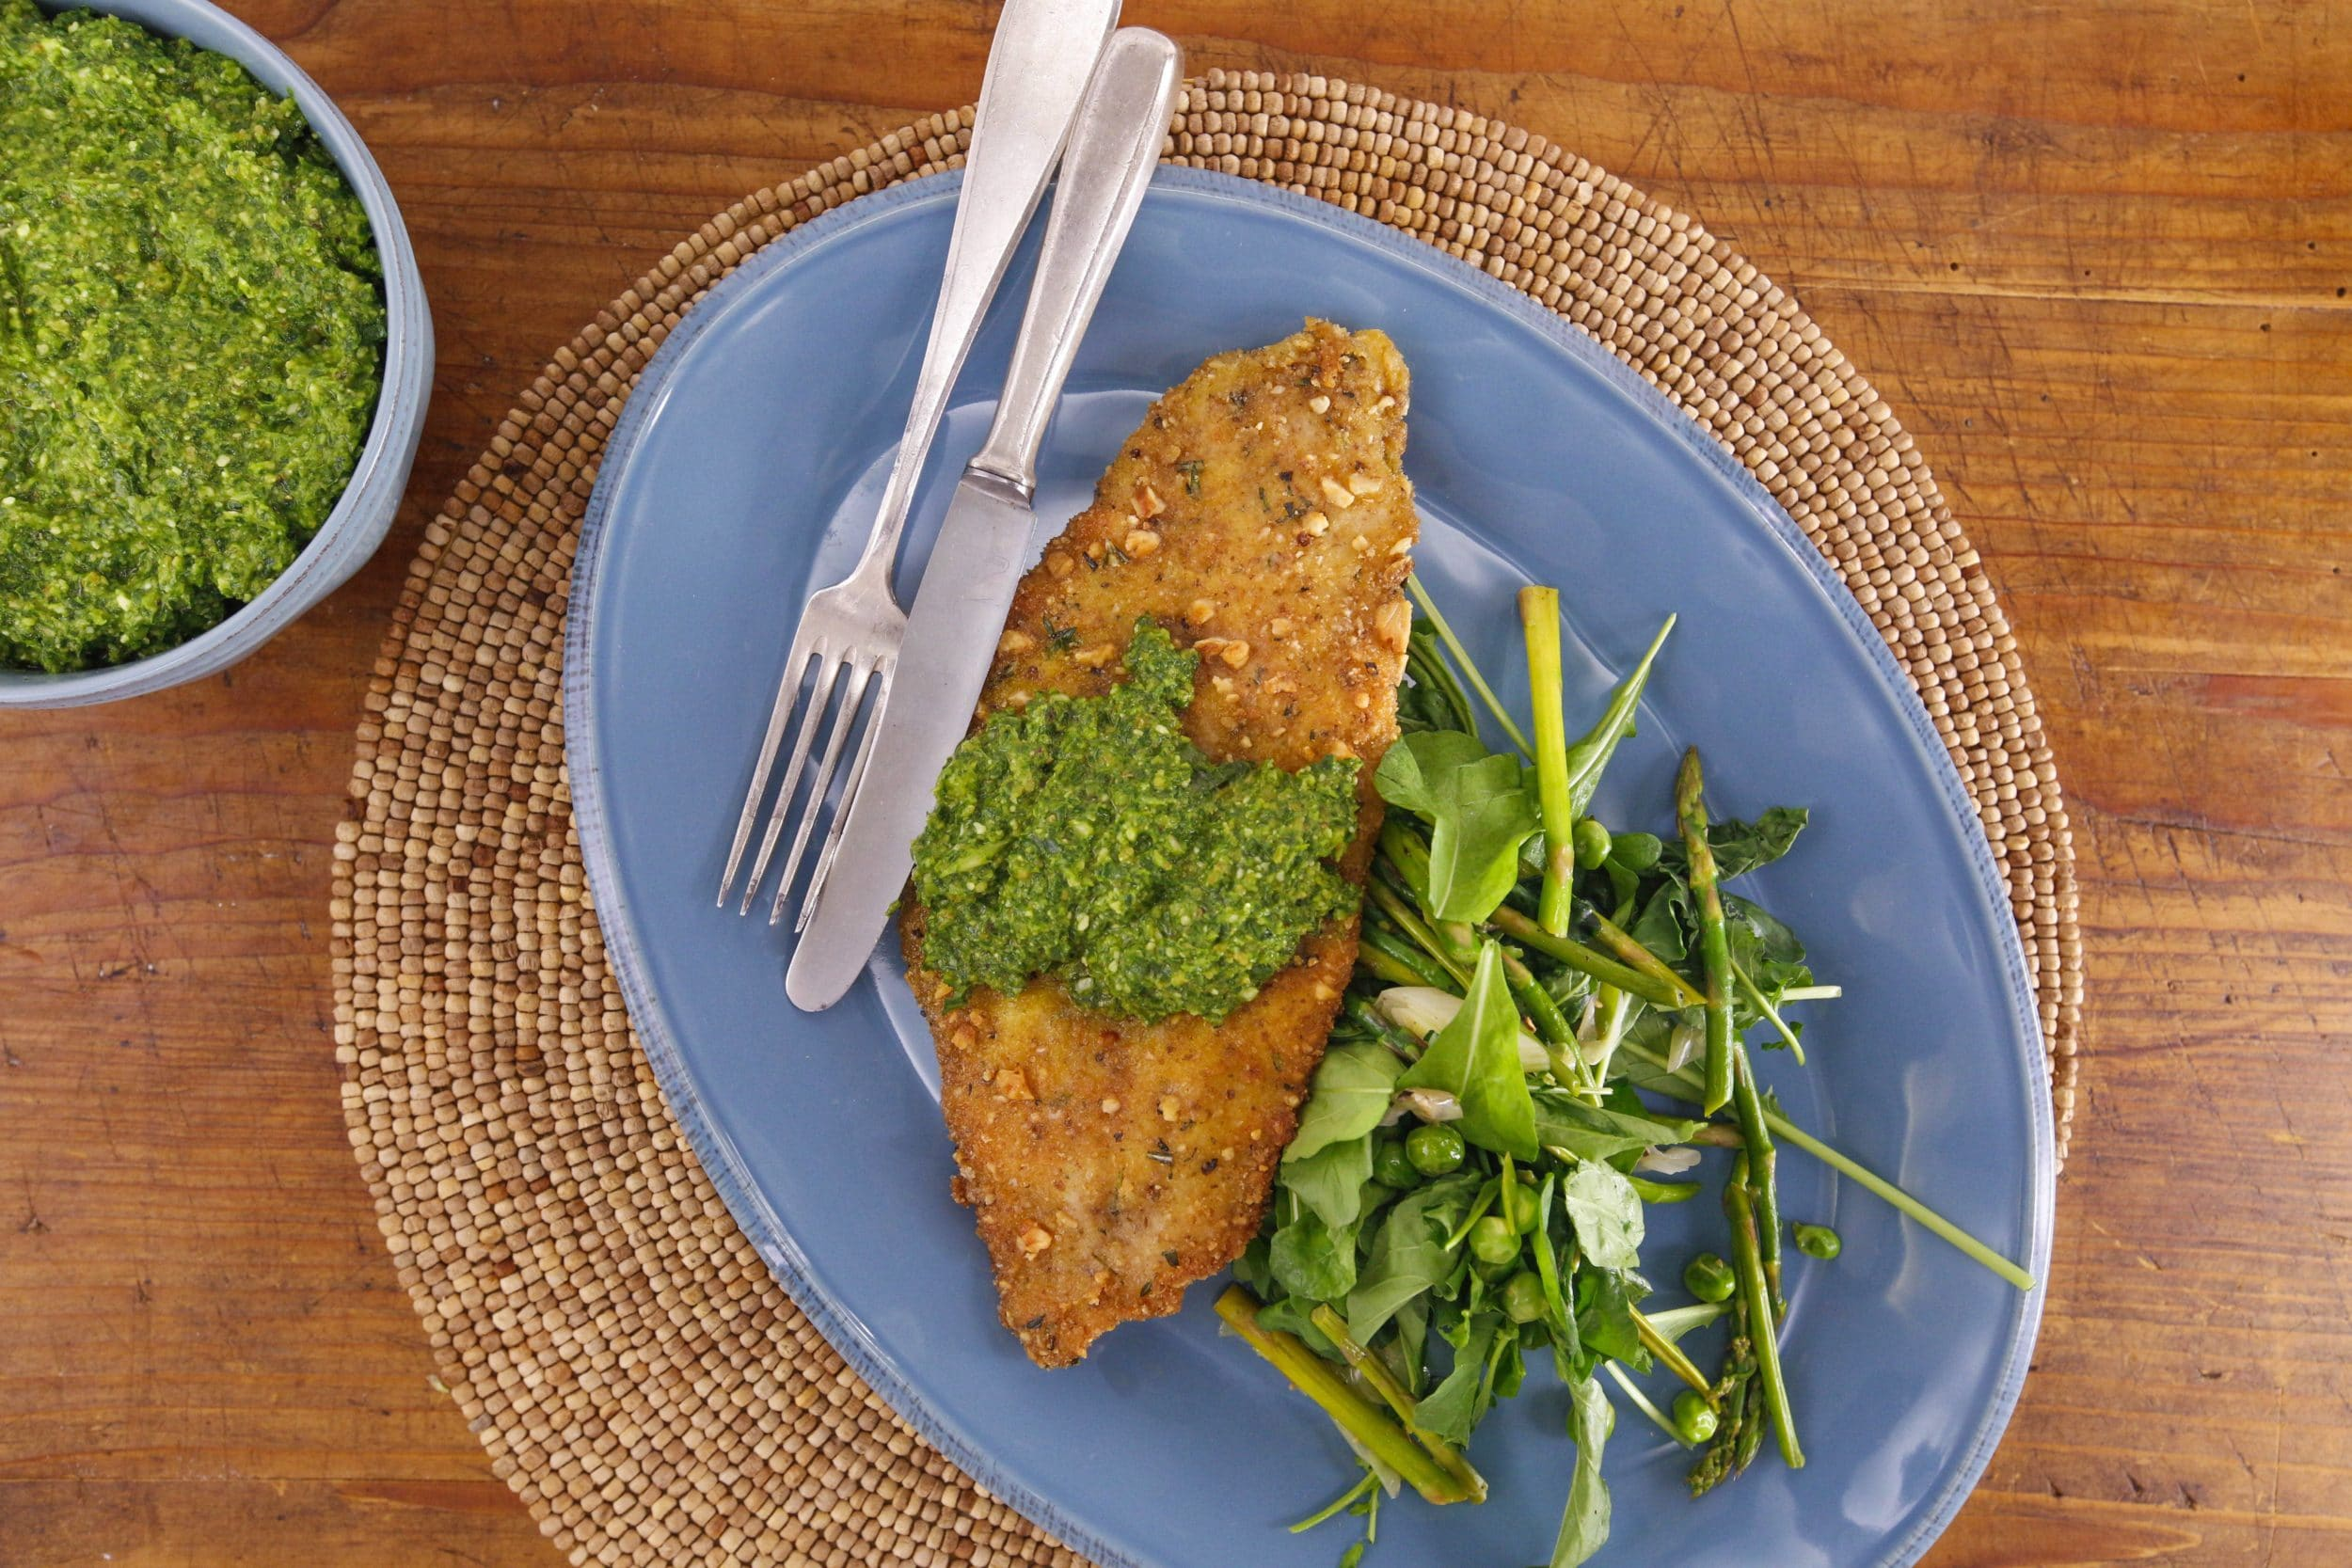 Filet of Sole Cutlets with Lemon-Chard Pesto, Spring Vegetables and Arugula